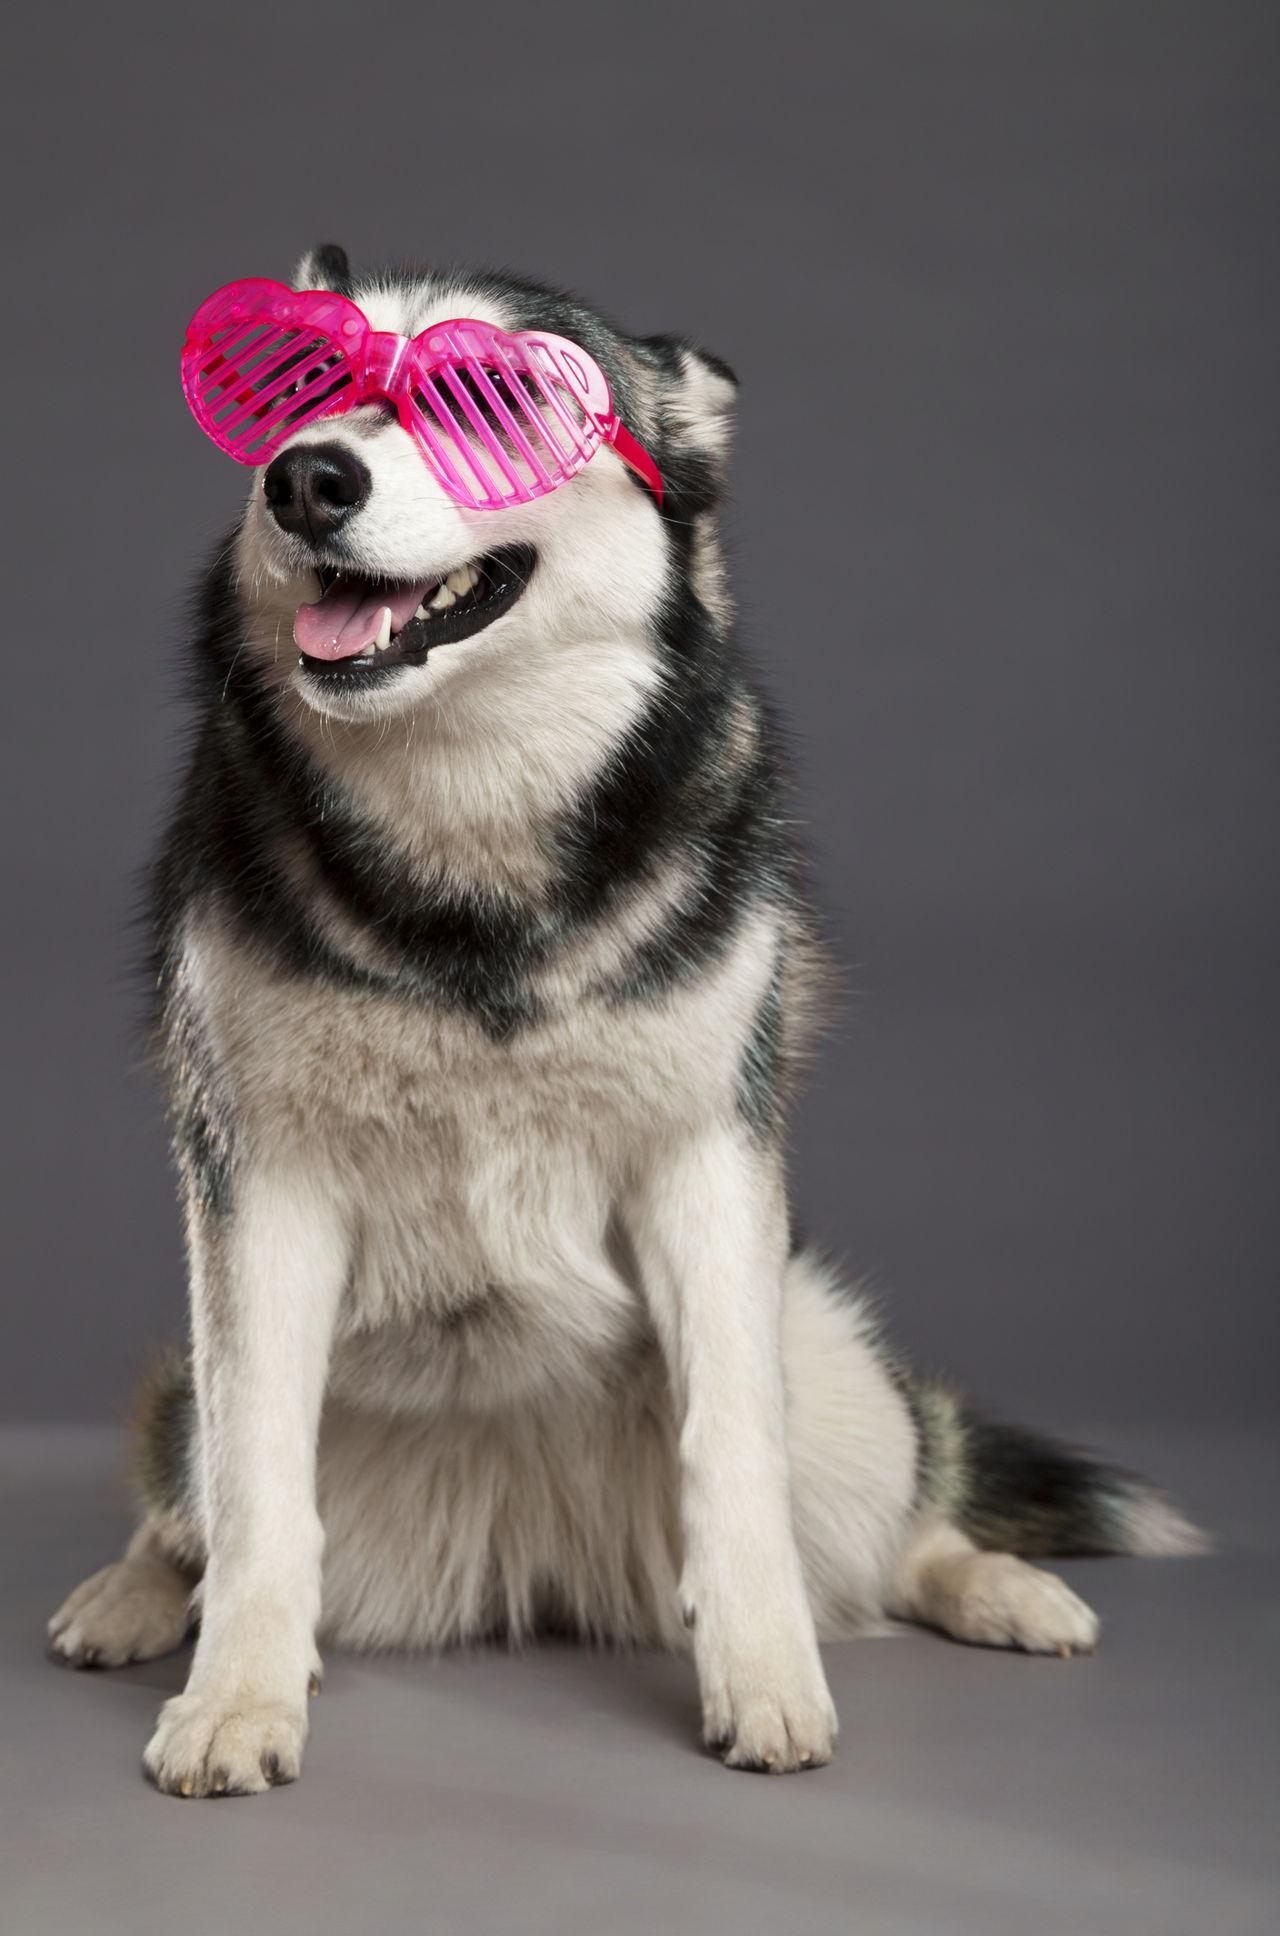 Unimaginably Stupefying Facts About The Alaskan Husky